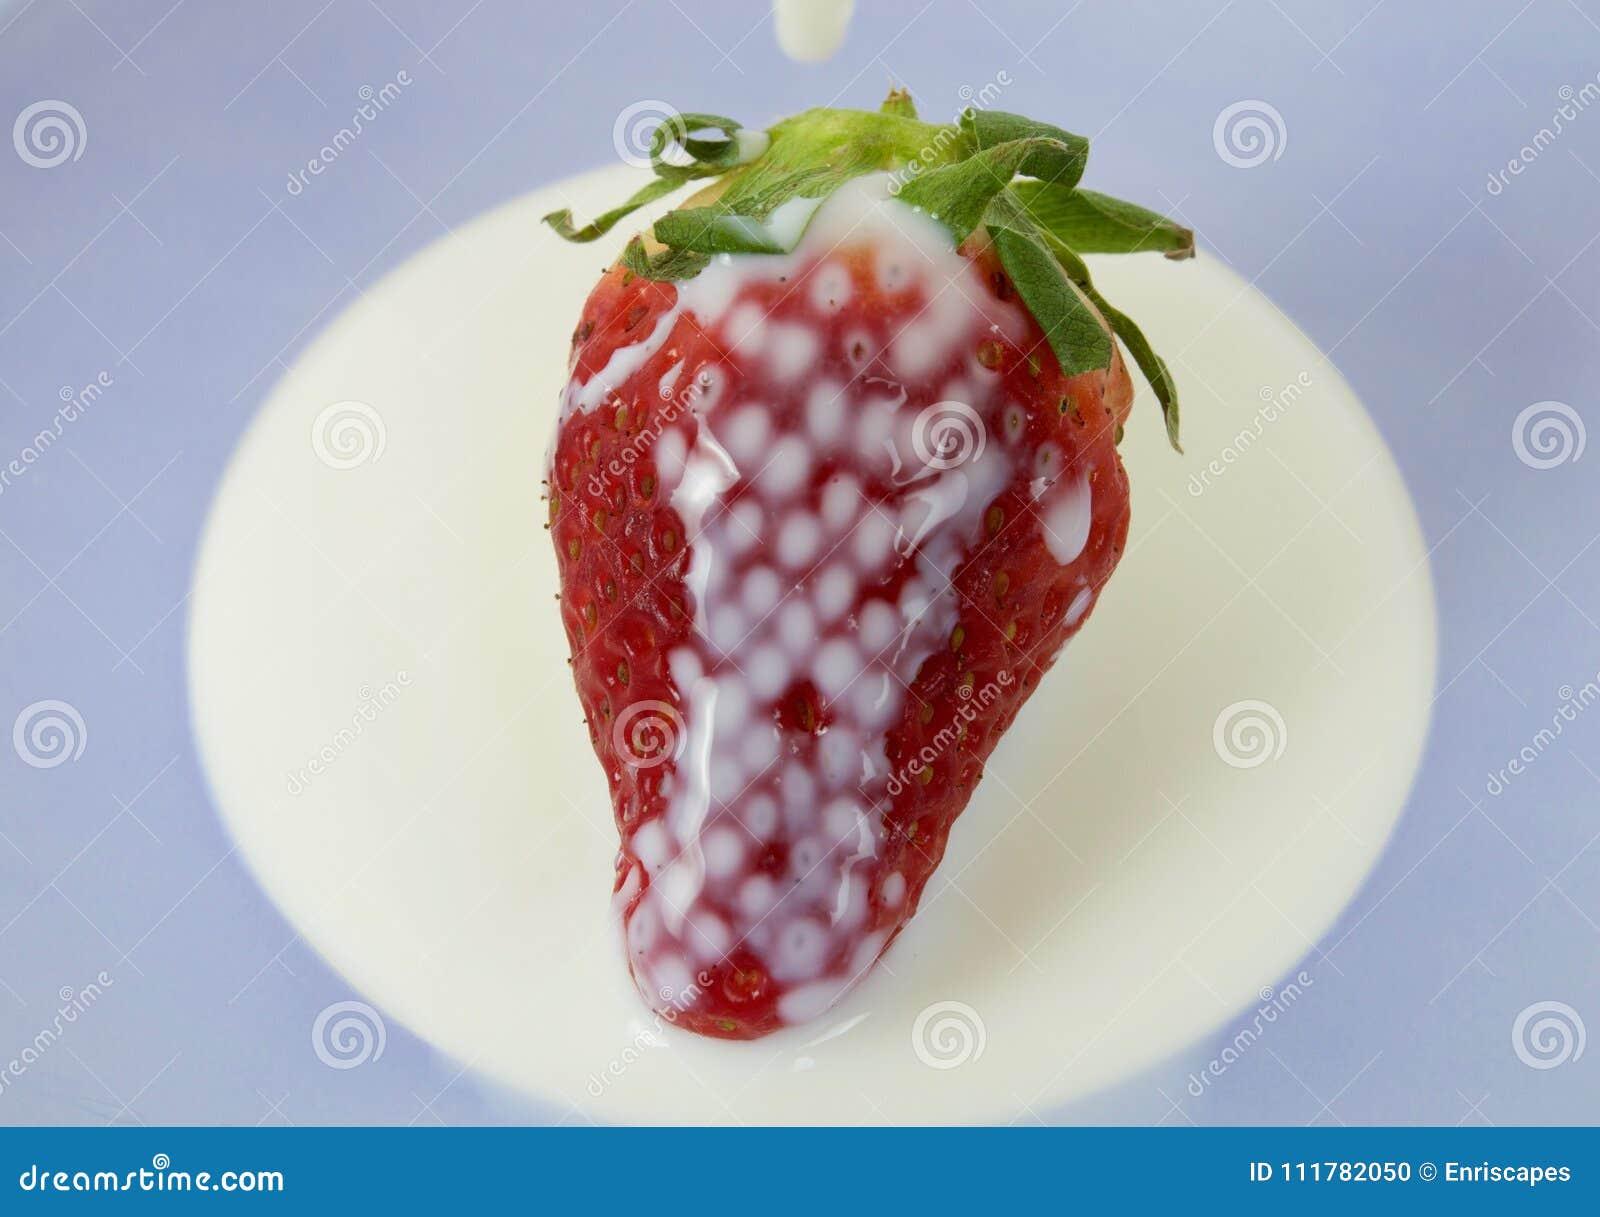 Strawberry bathed in milk